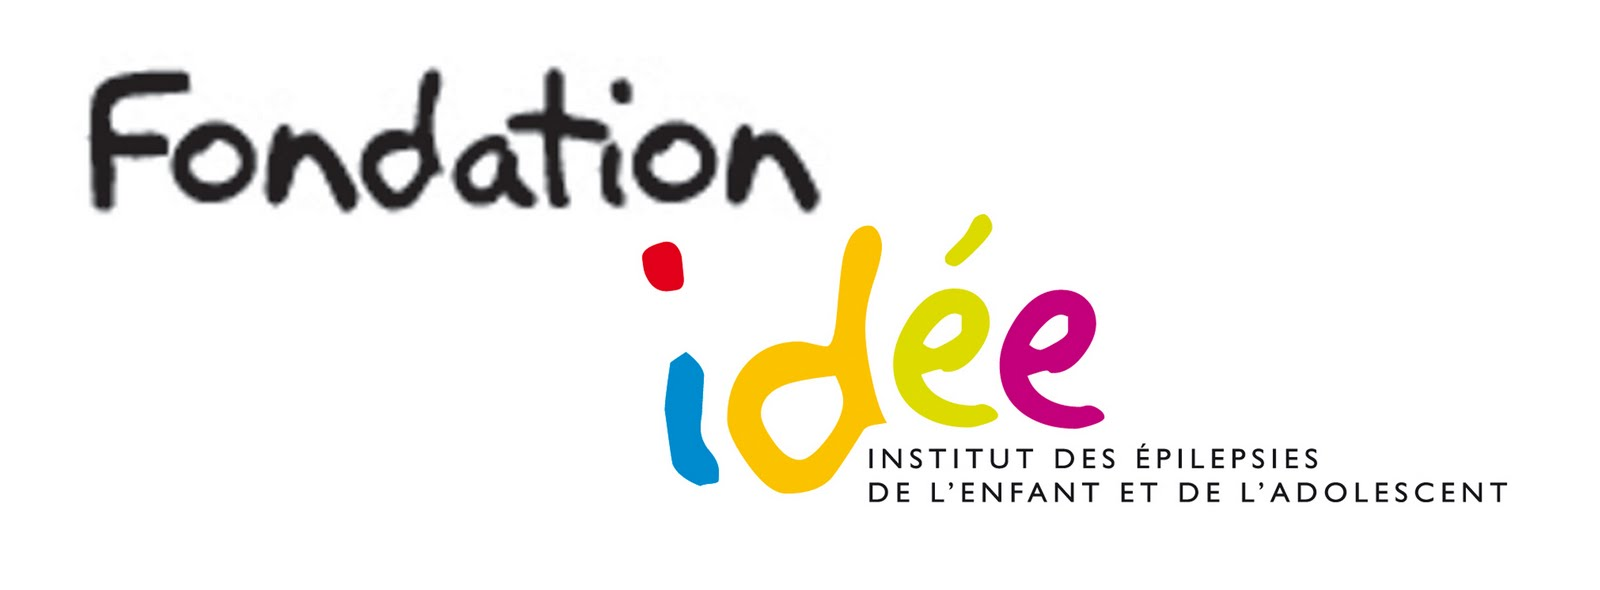 Fondation Idée